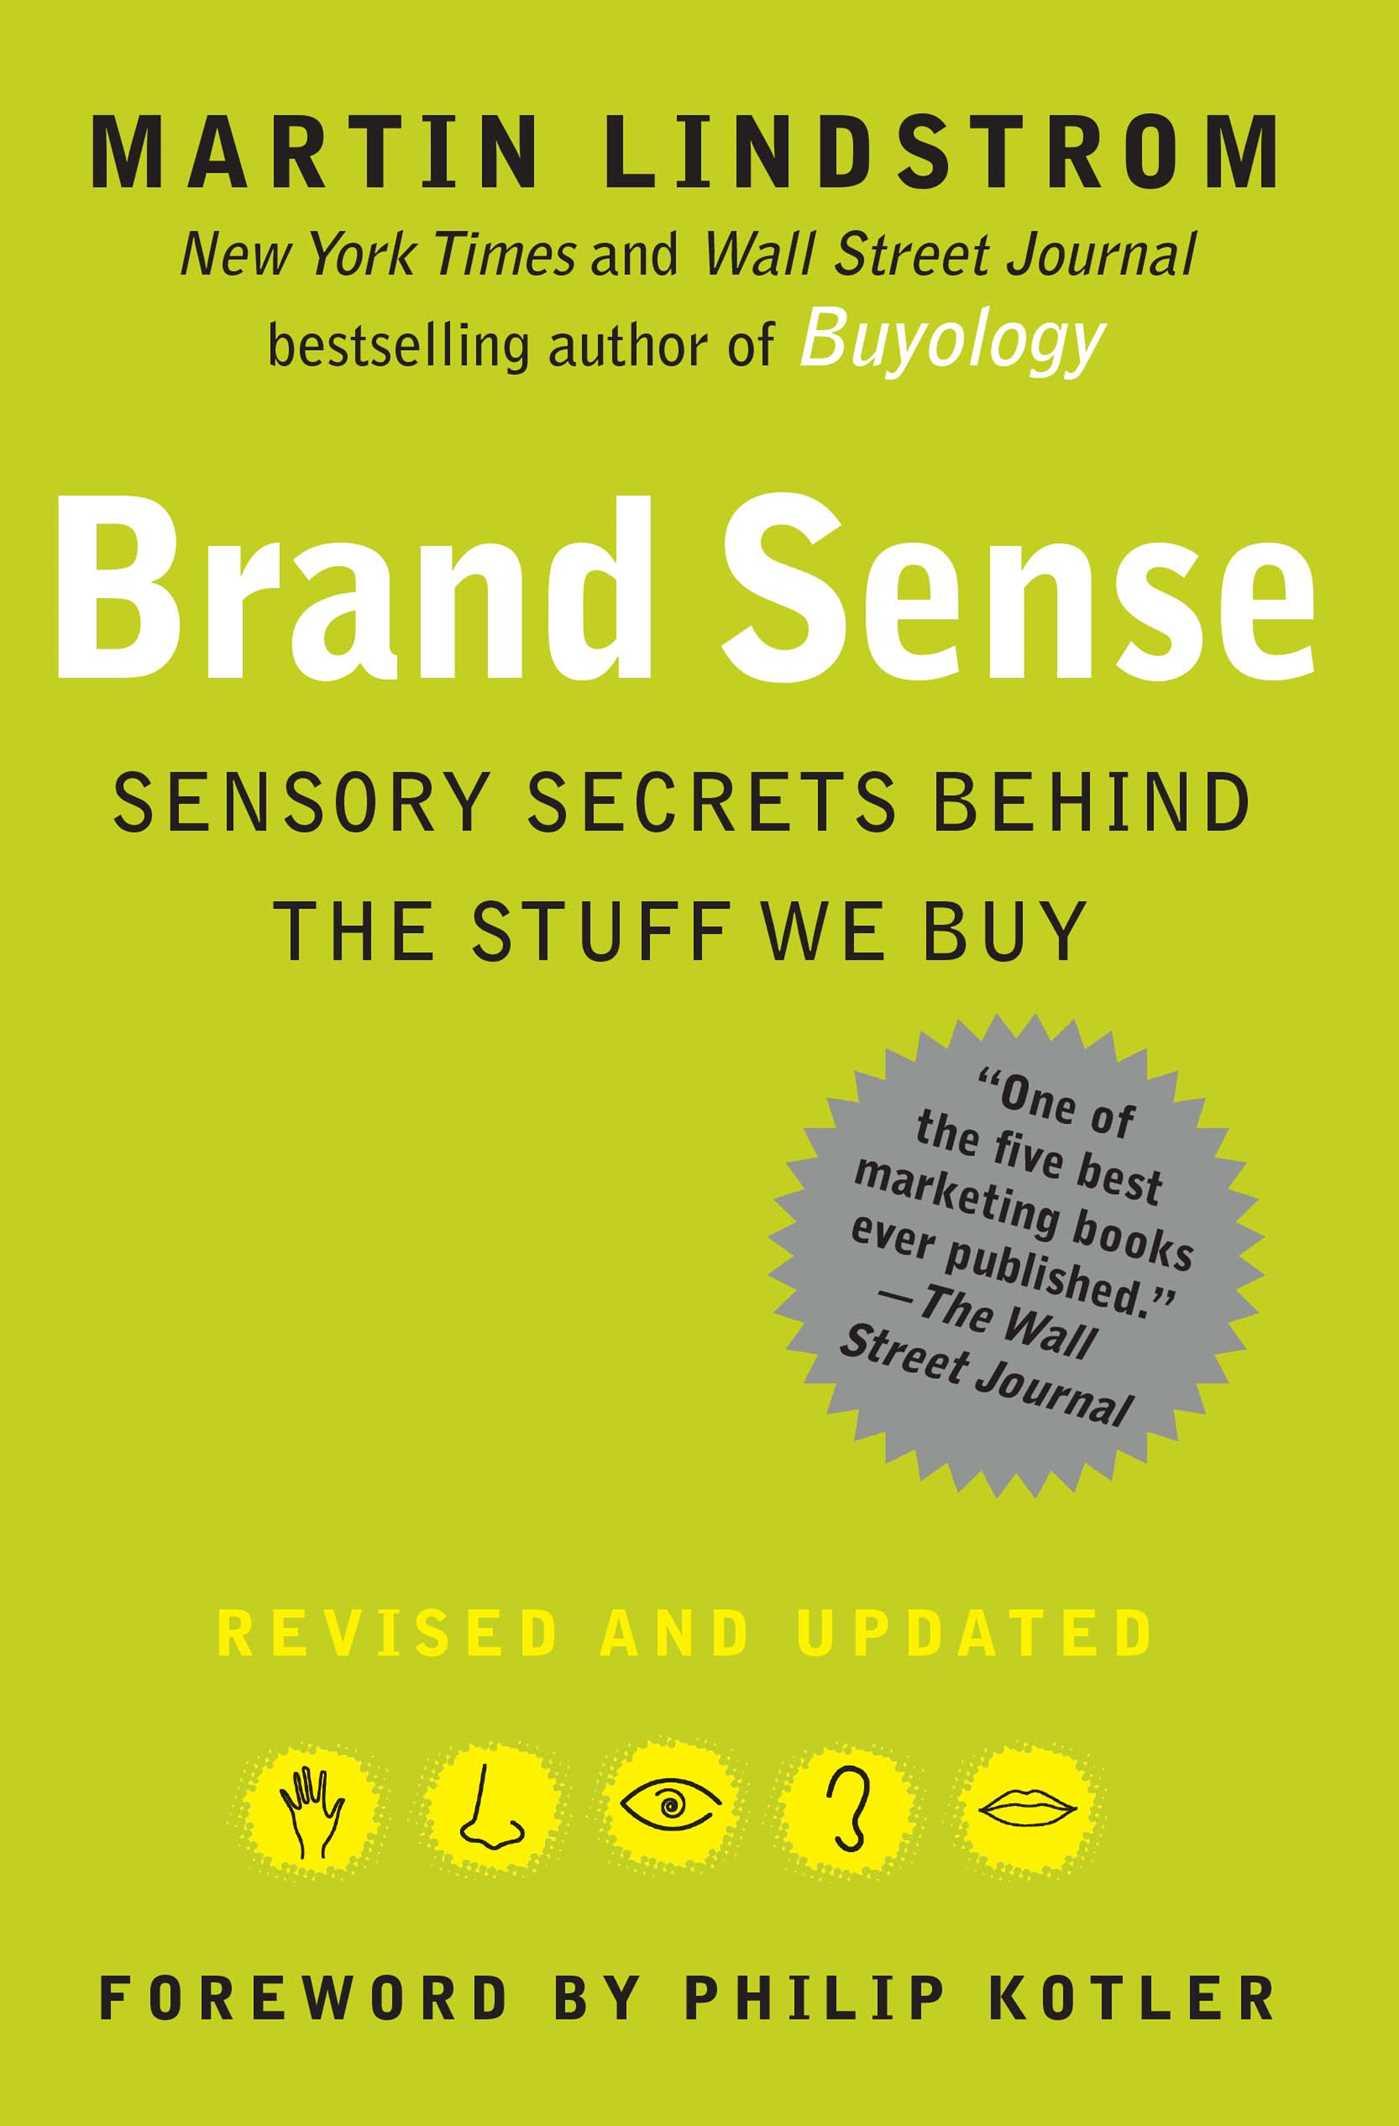 Brand sense 9781439172018 hr